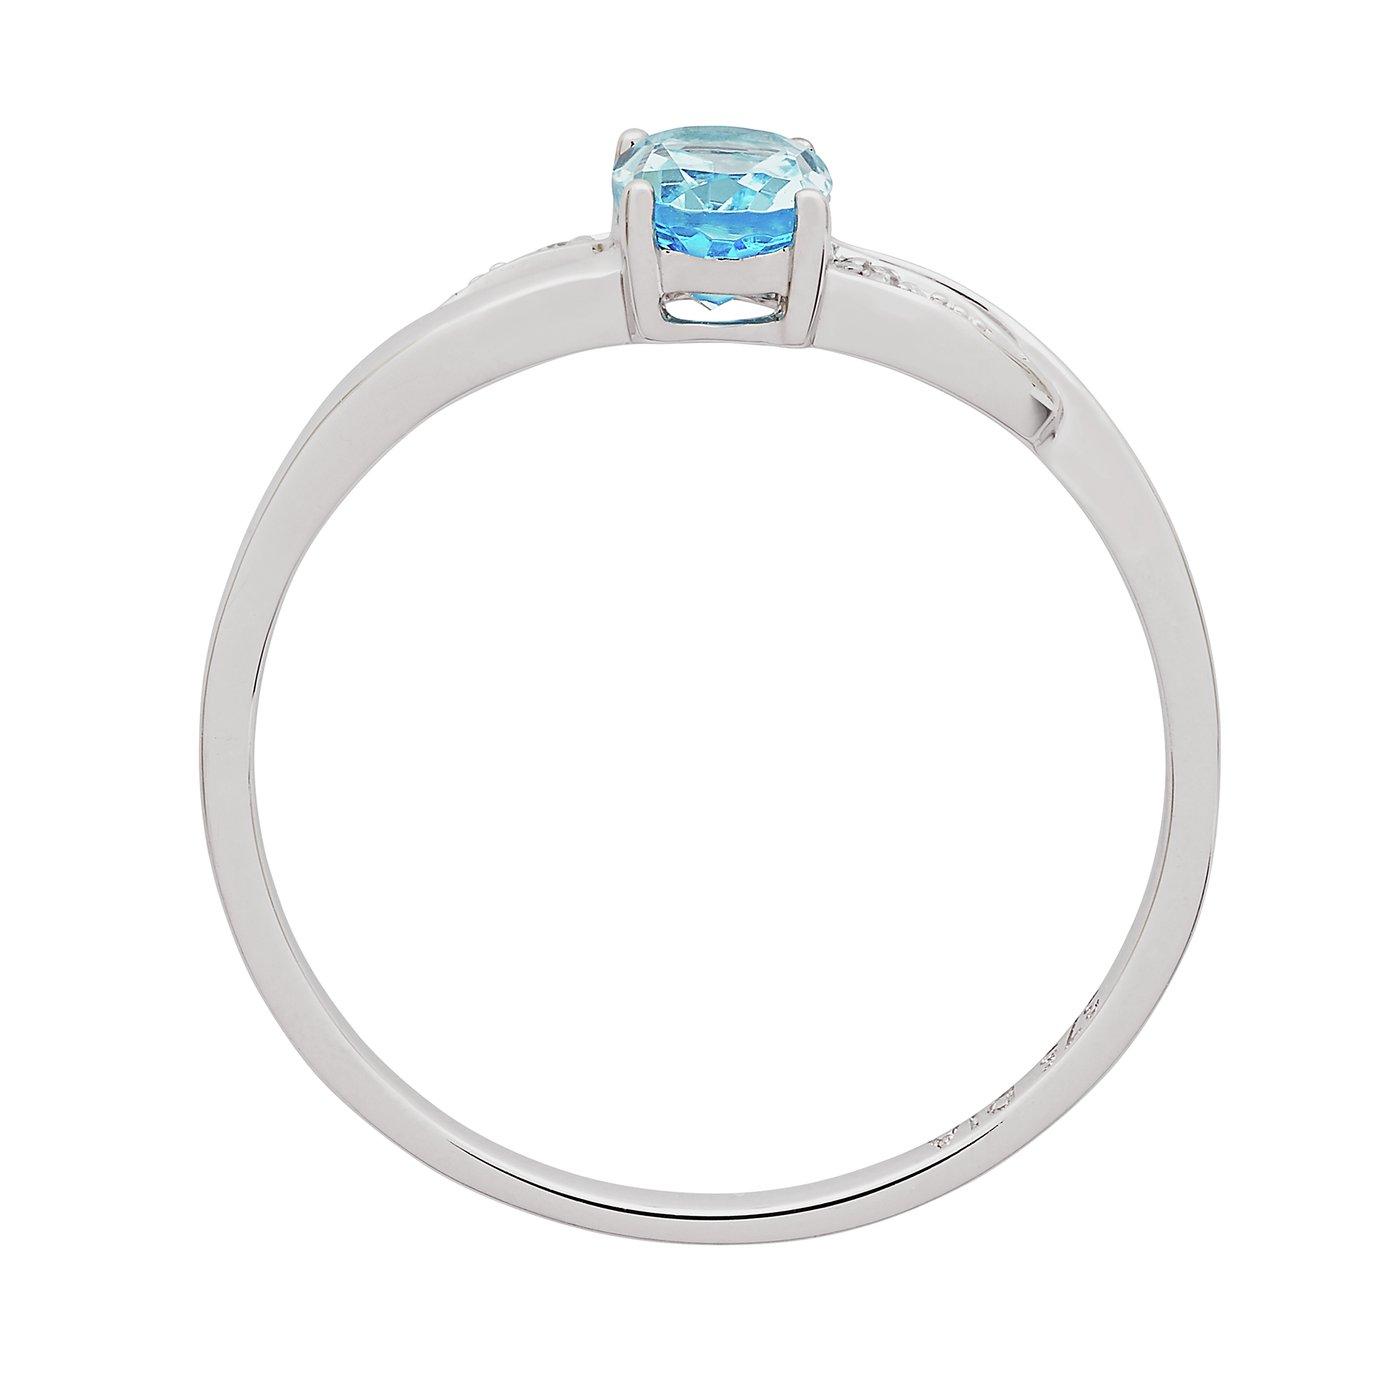 Revere 9ct White Gold Blue Topaz and Diamond Twist Ring - N